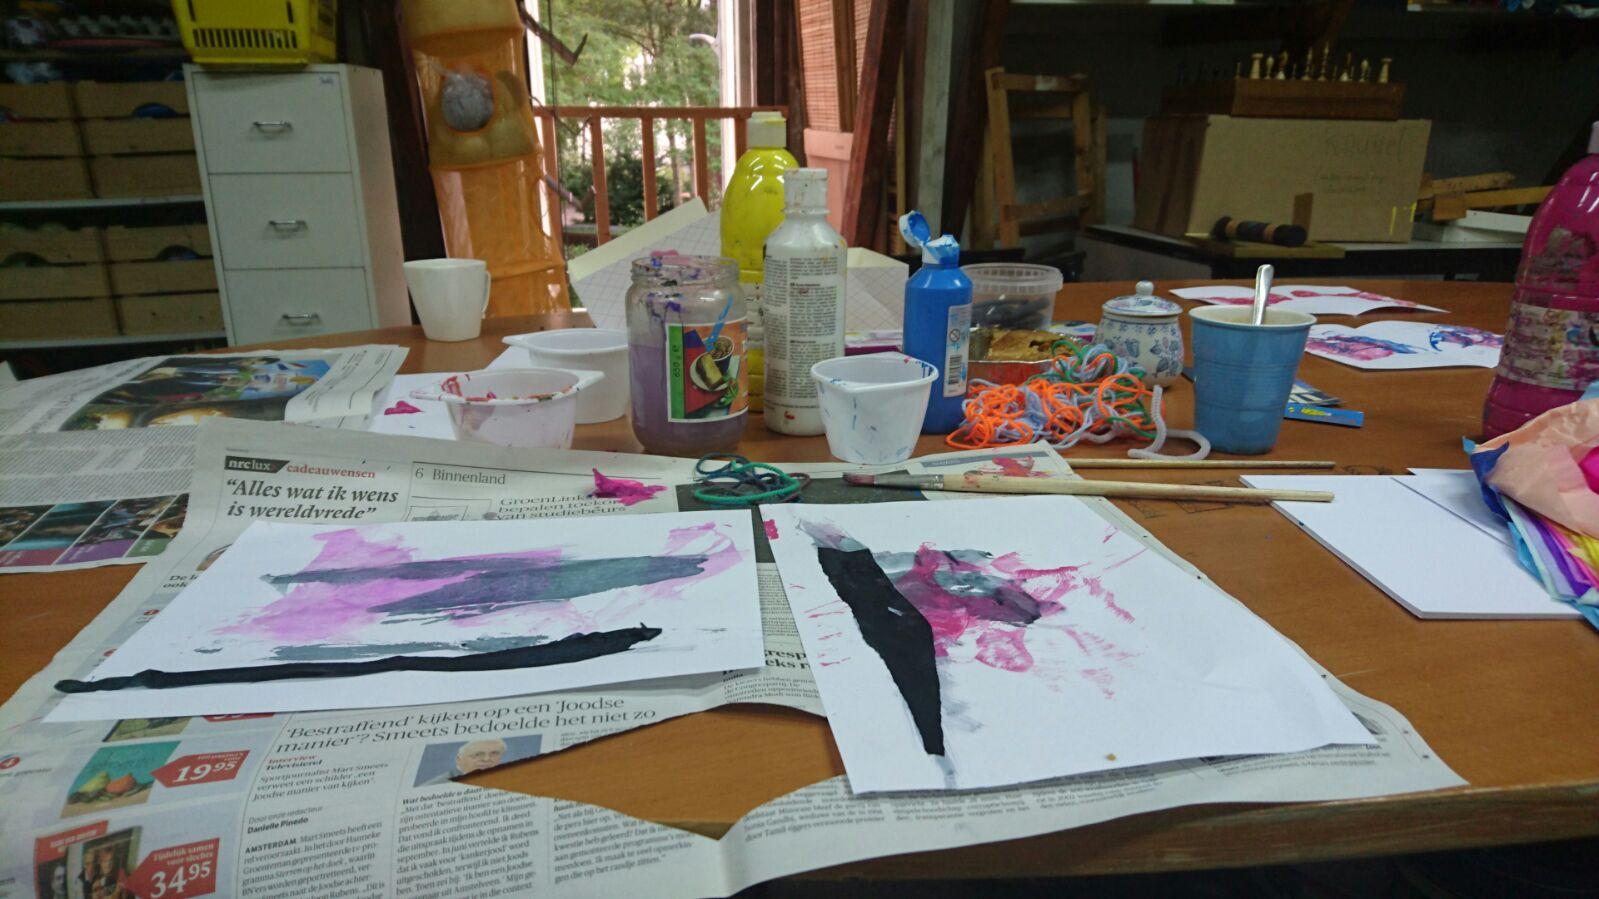 atelier activiteiten